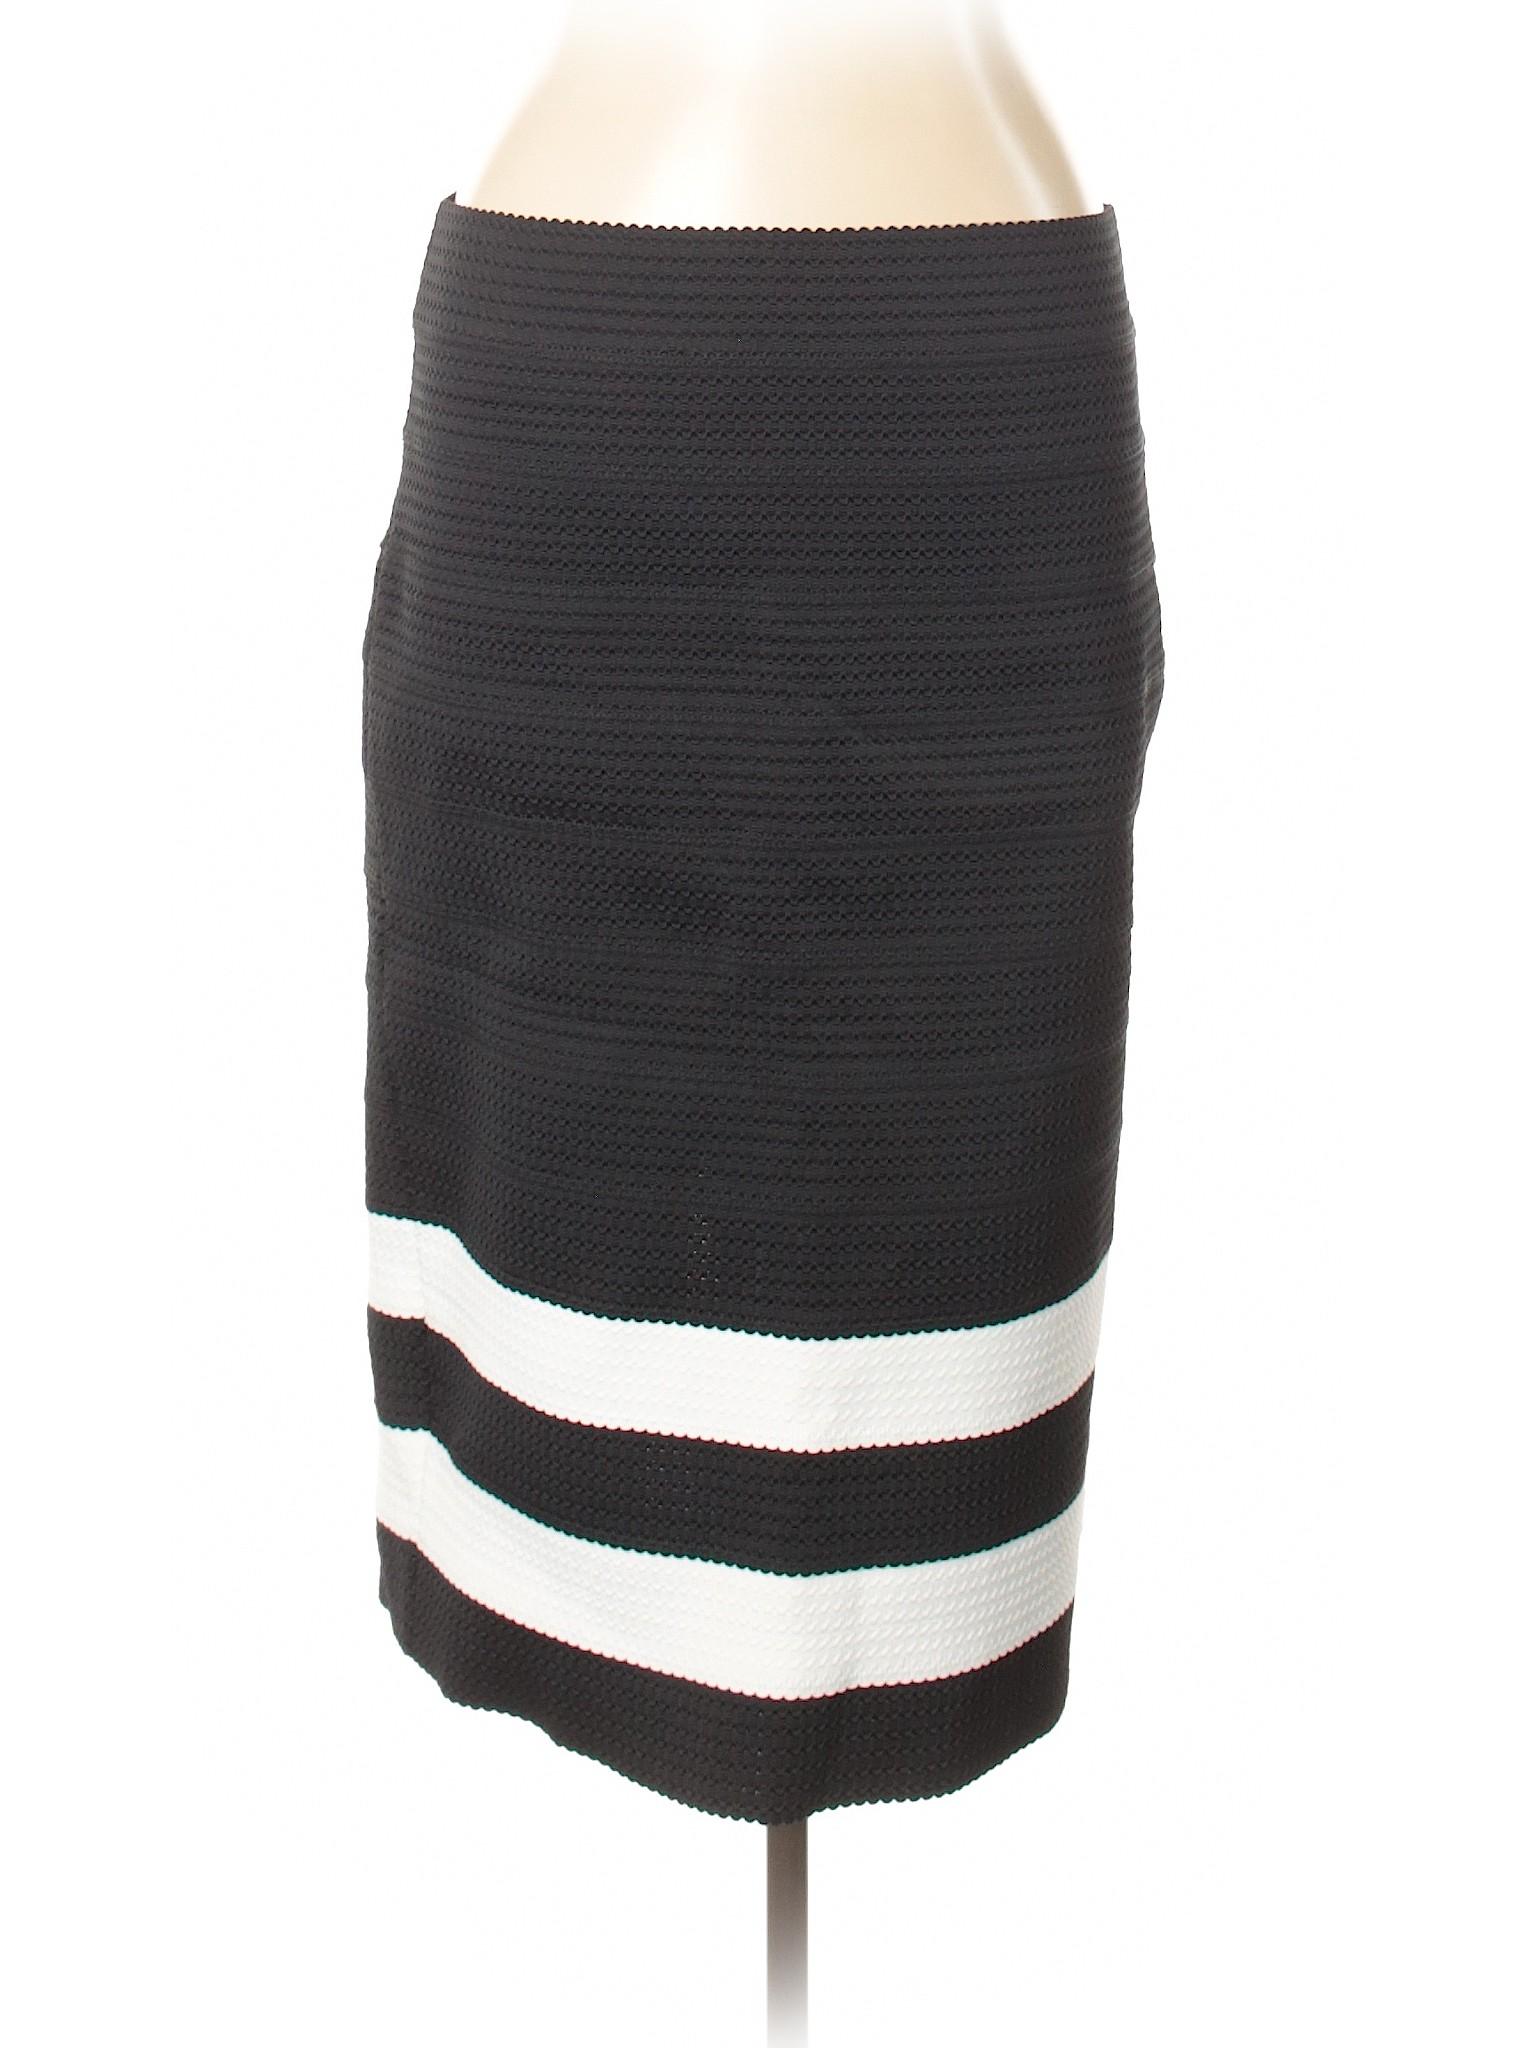 Boutique Skirt Boutique Boutique Skirt Skirt Skirt Skirt Casual Casual Boutique Casual Casual Boutique Casual Casual Boutique IwCIZqf